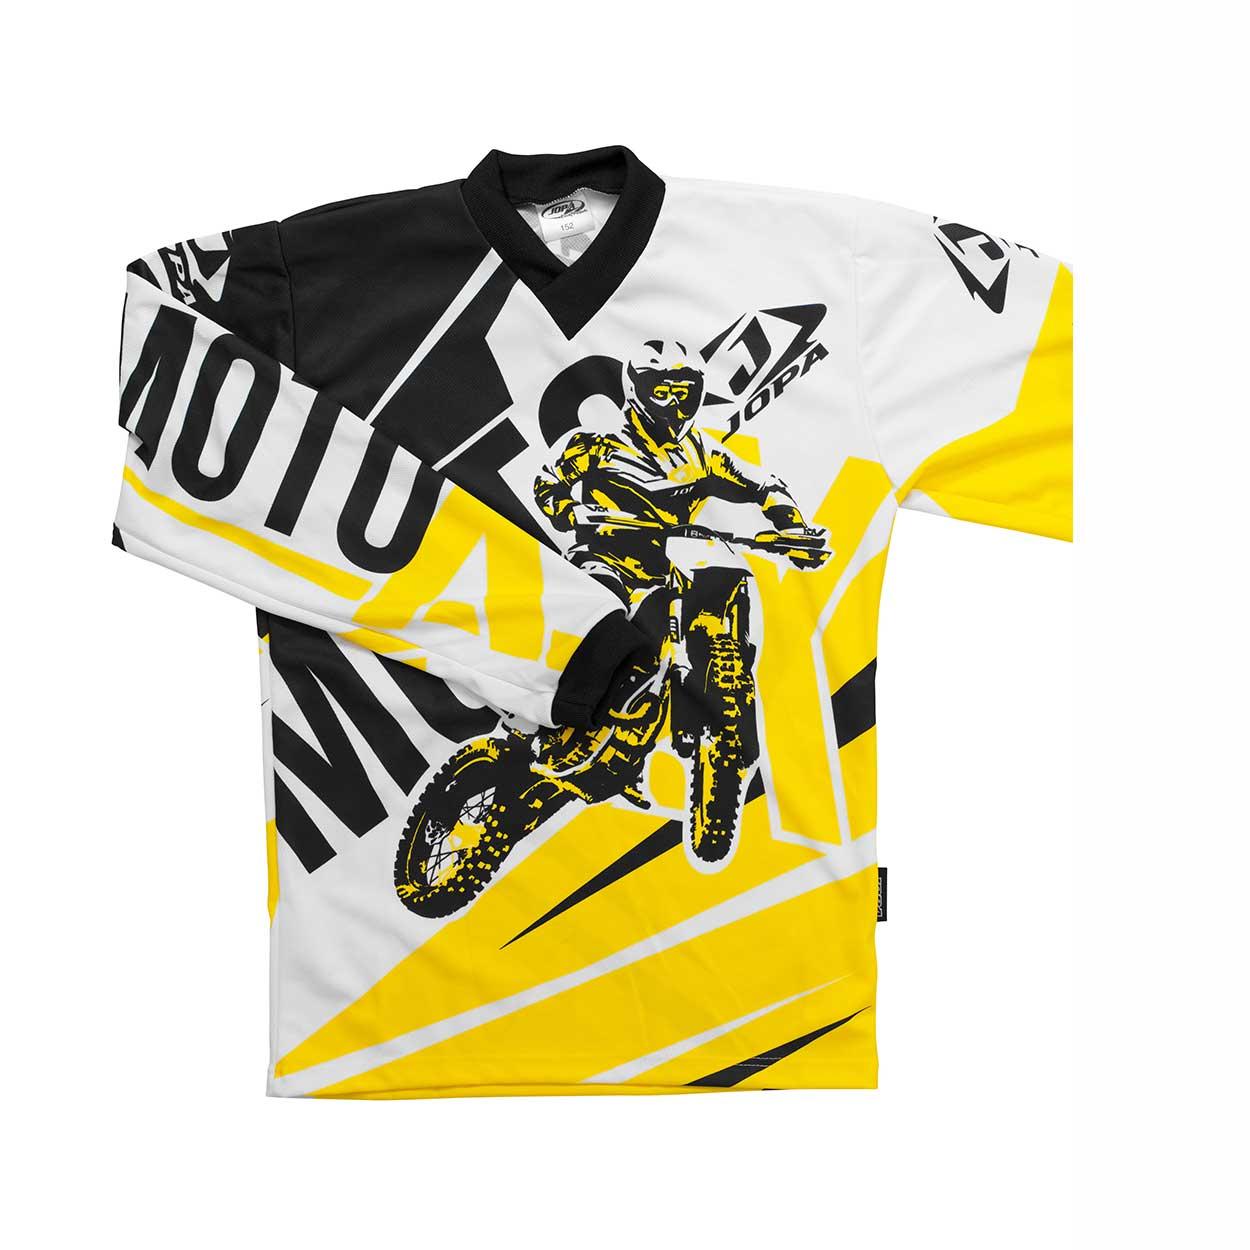 Jopa Kinder Shirt Moto-X Yellow-98